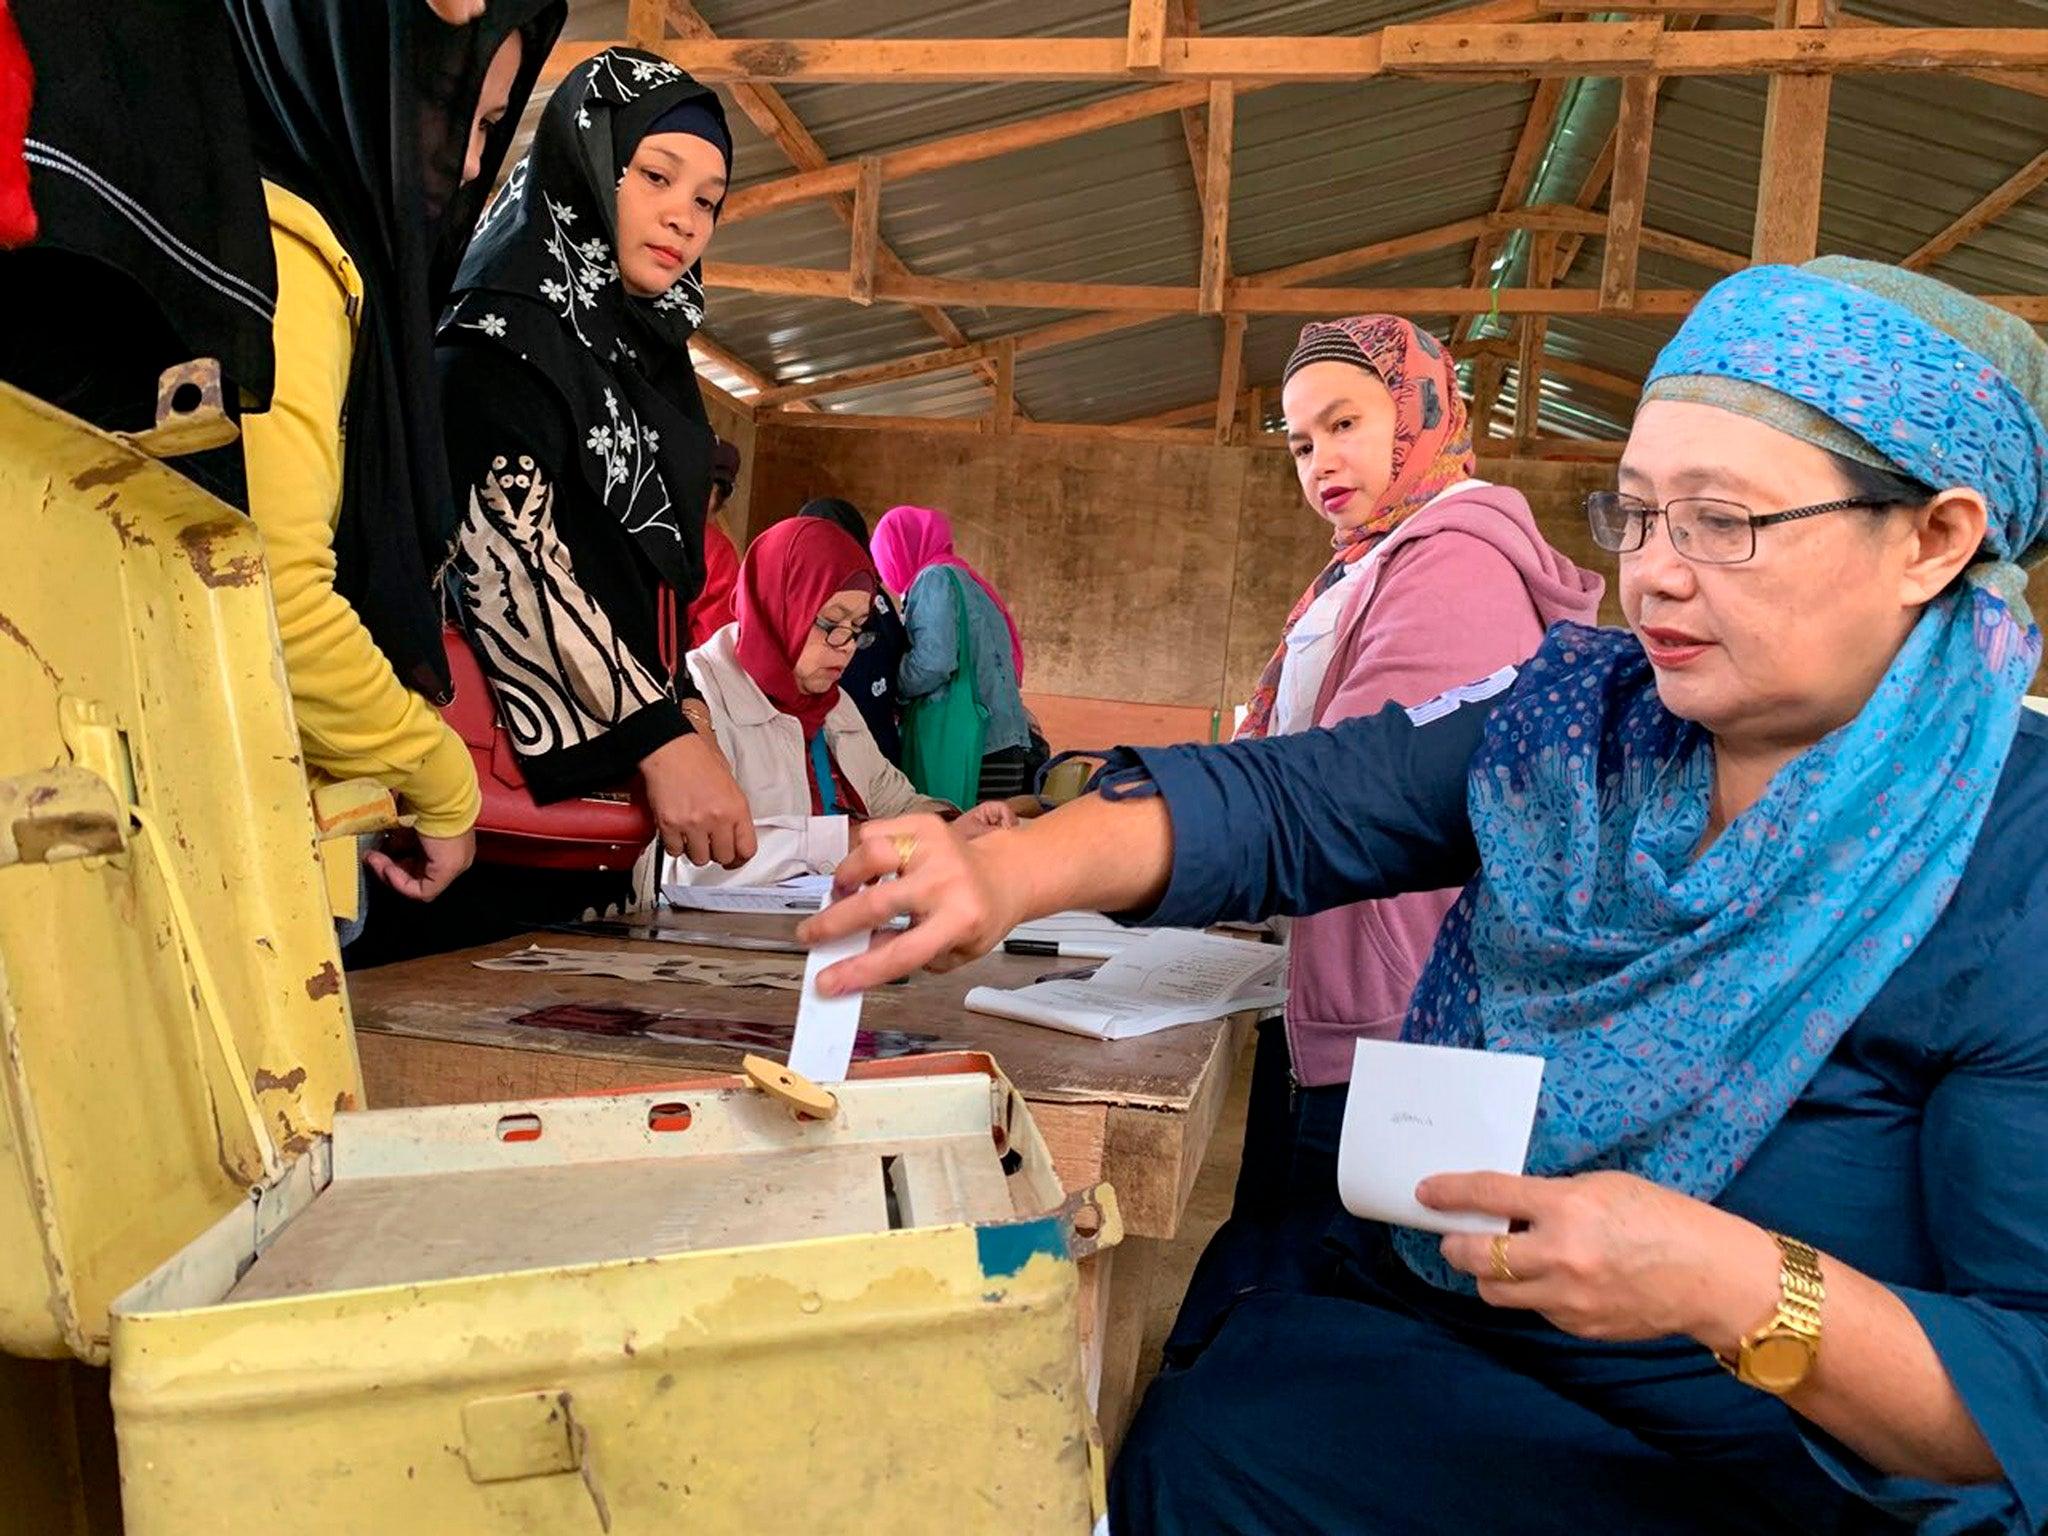 Muslim Filipino voters in autonomous region | The Independent